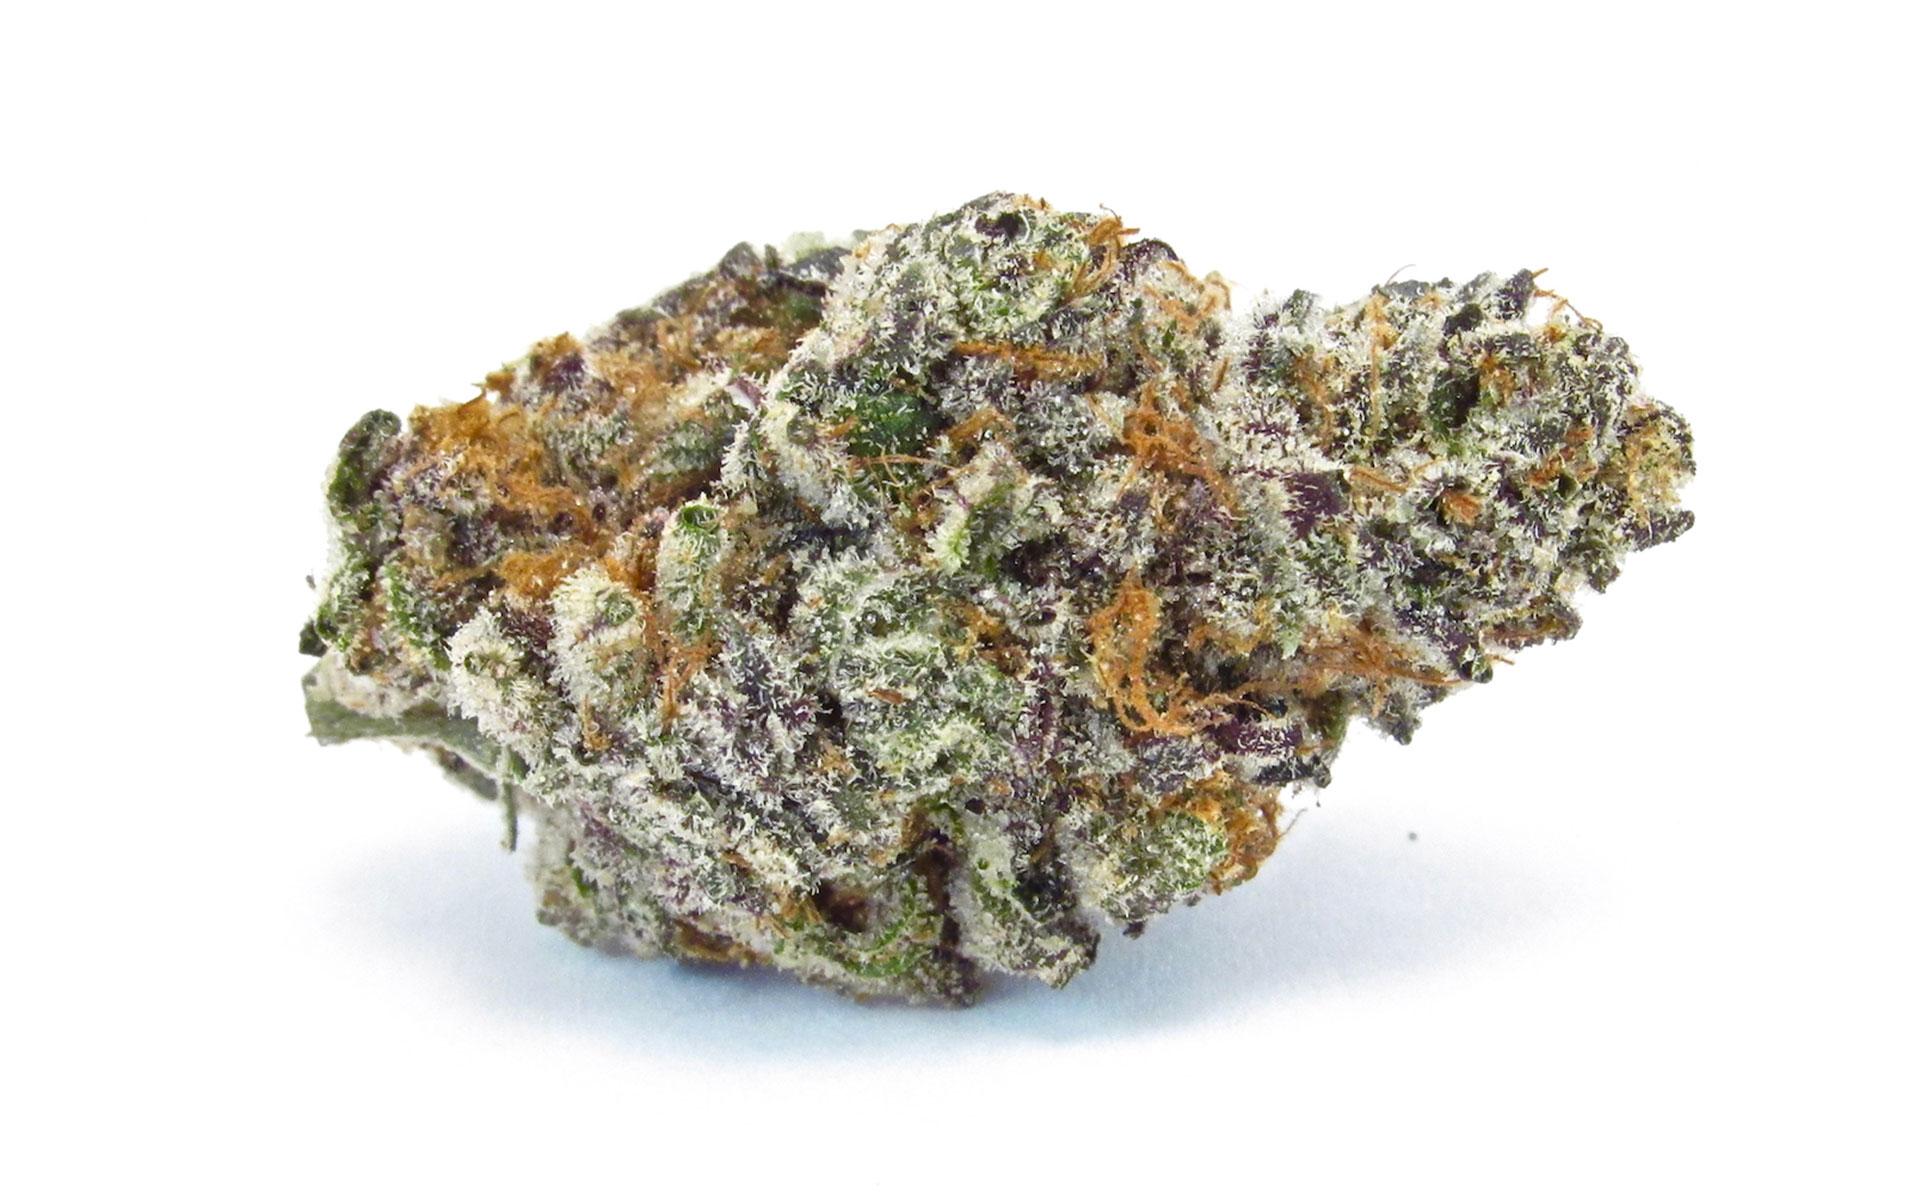 marijuana harvest strains Occidental Hill's Banana OG—the best of the bunch. (David Downs/Leafly)